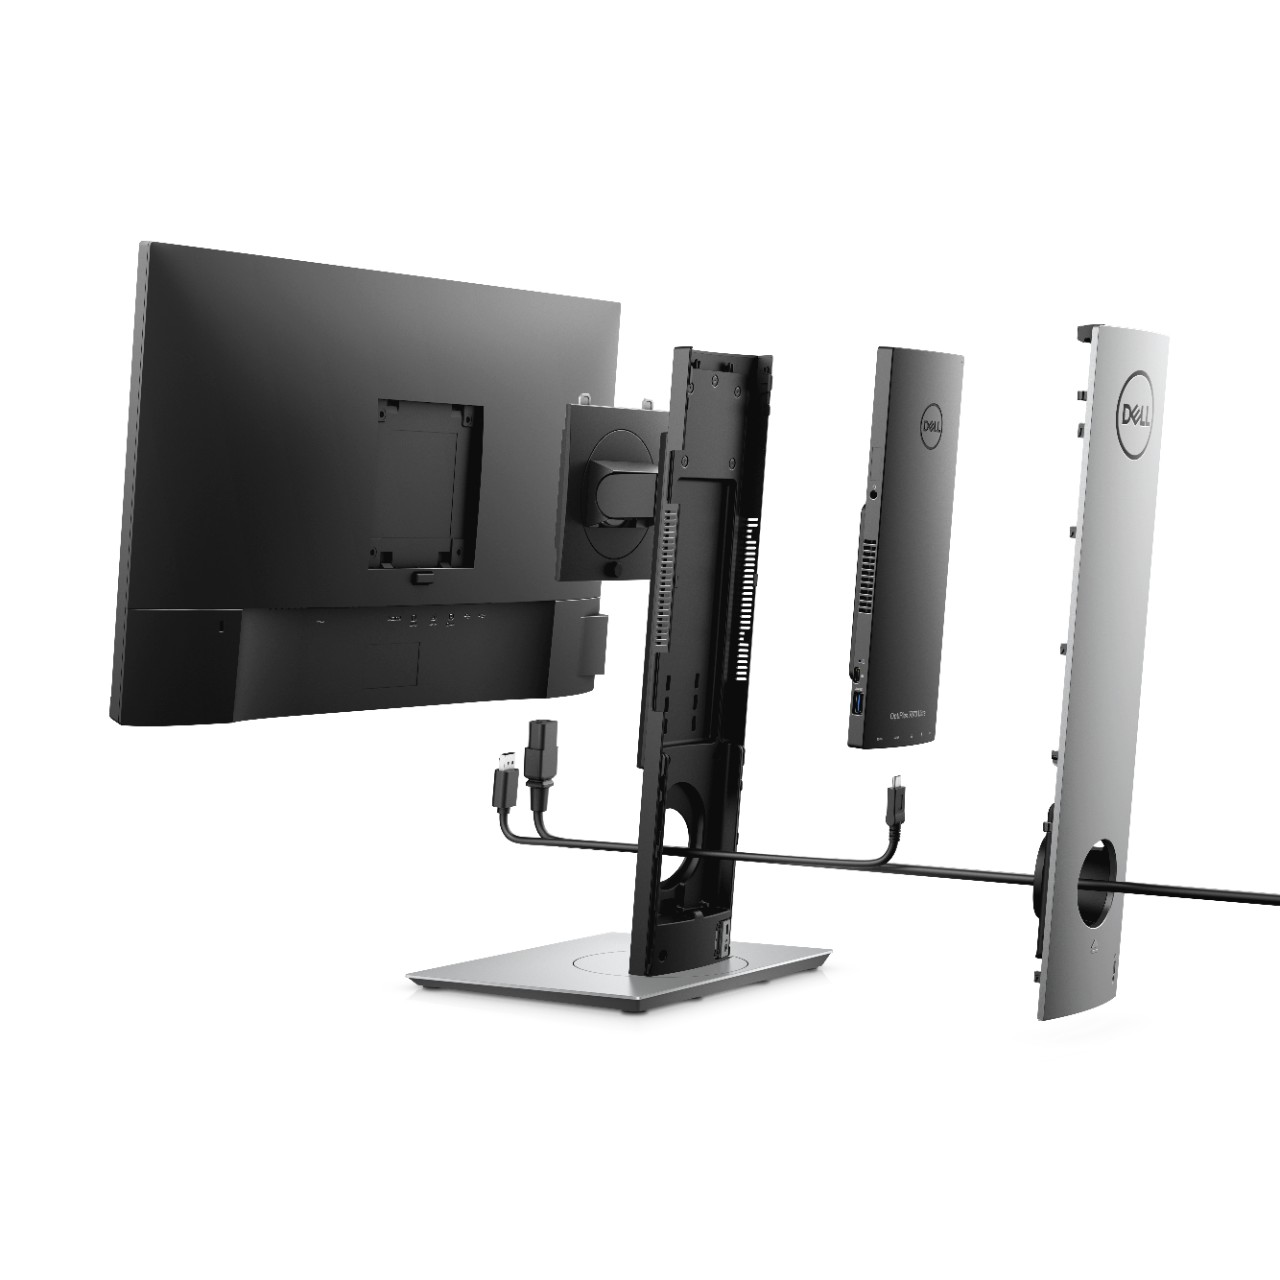 Dell Introduced OptiPlex 7070 Ultra